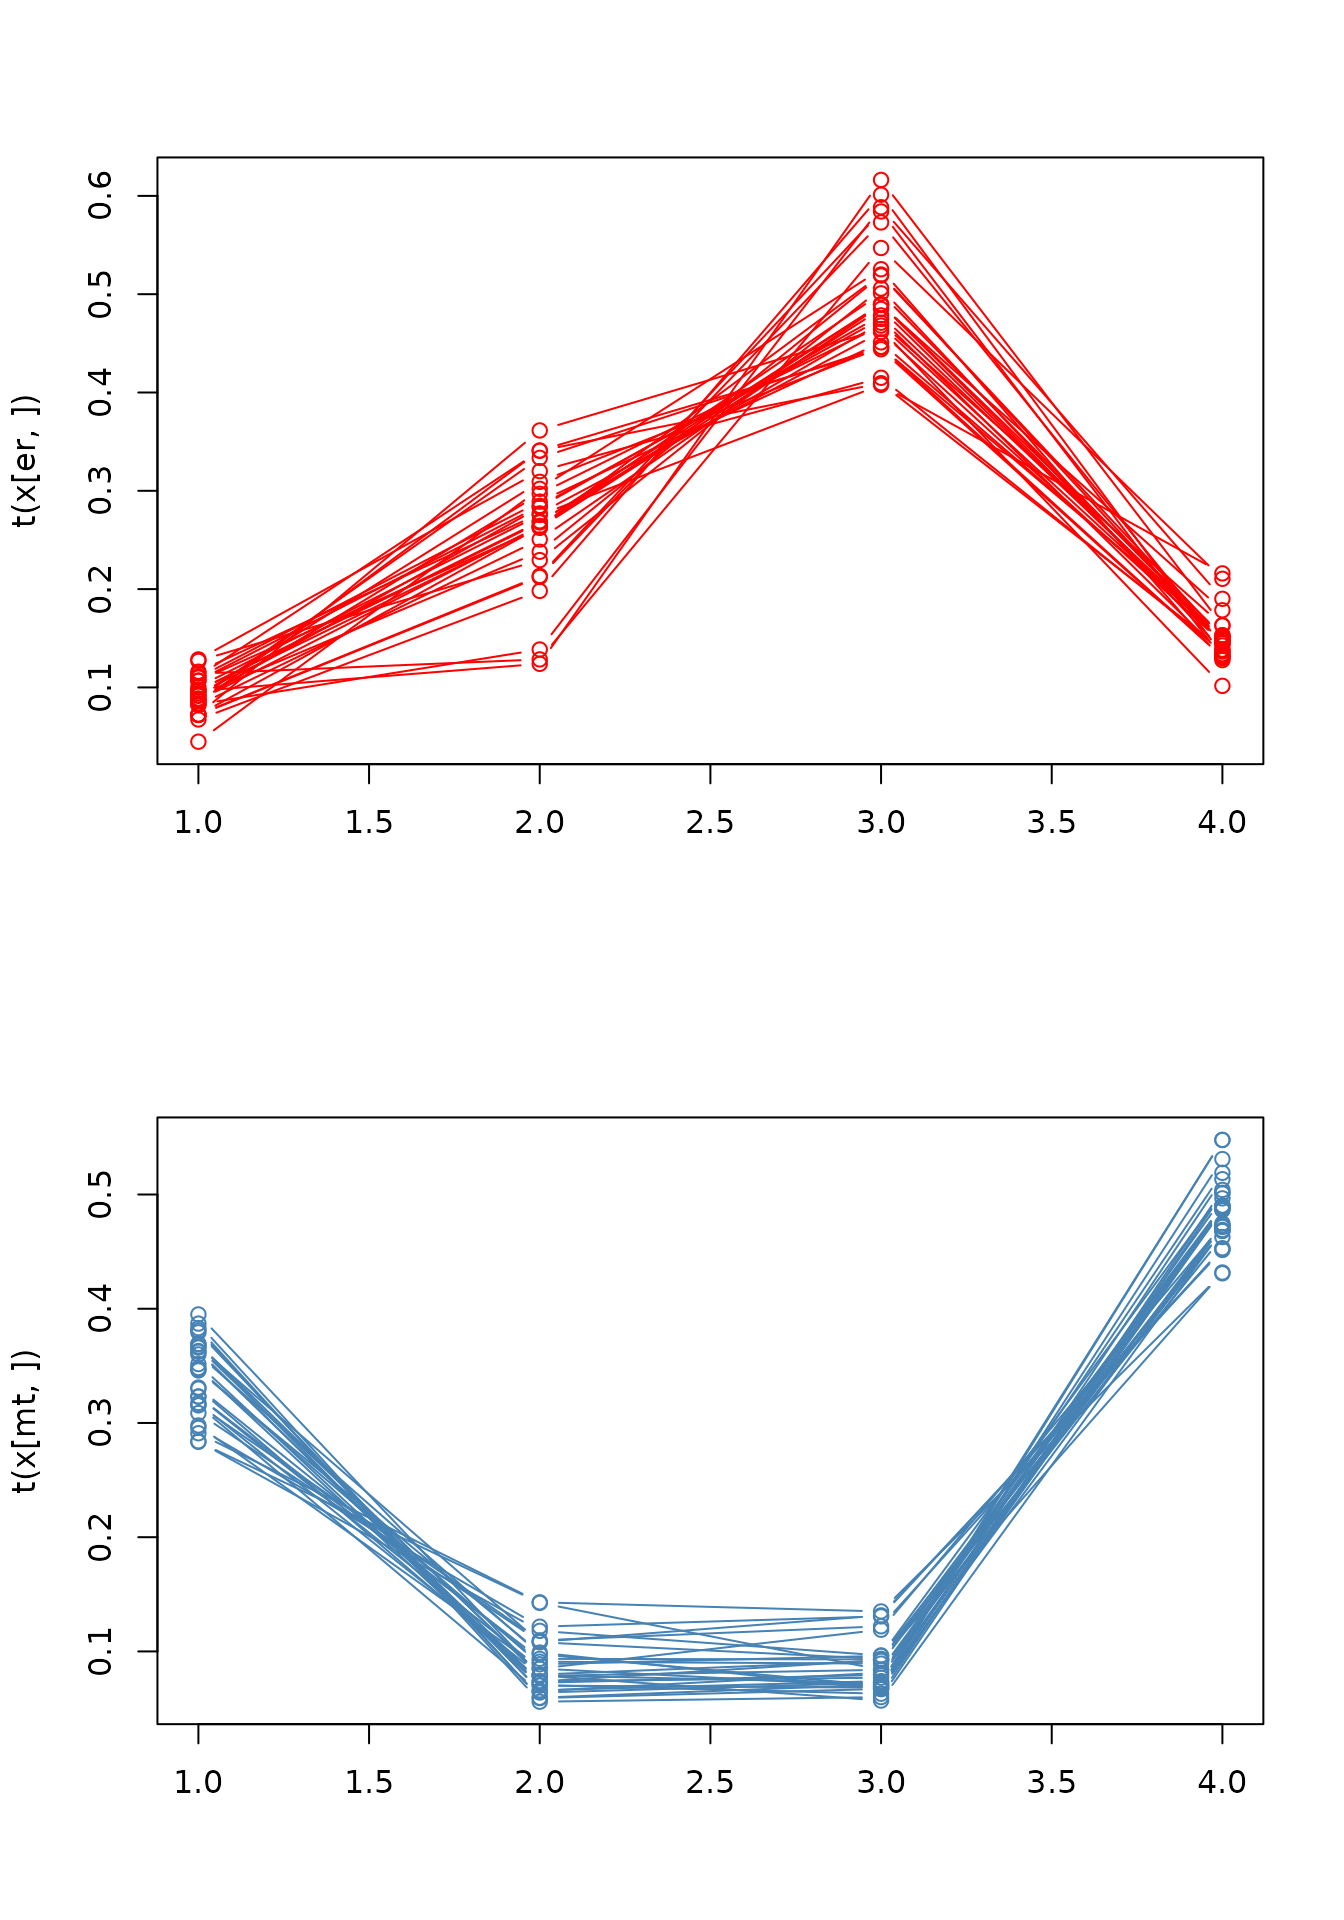 Visualisation of proteomics data using R and Bioconductor